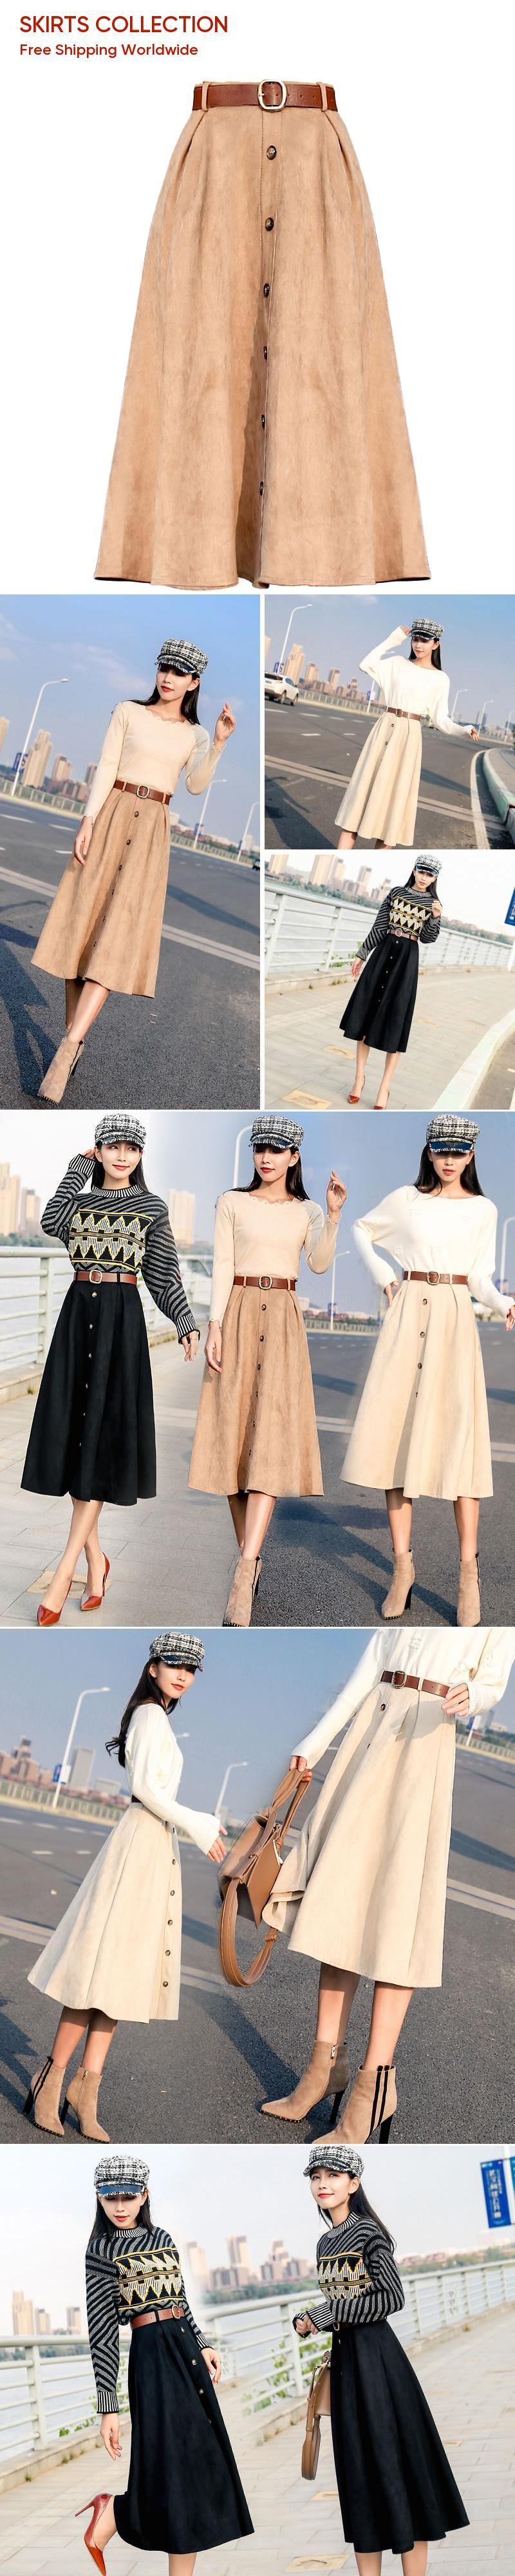 411d66b9422dd Office Lady Winter False Velvet Elegant Fashion Skirt 2019 New Spring Half  Long High Waist Plus Size A-skirt Girls Casual Party